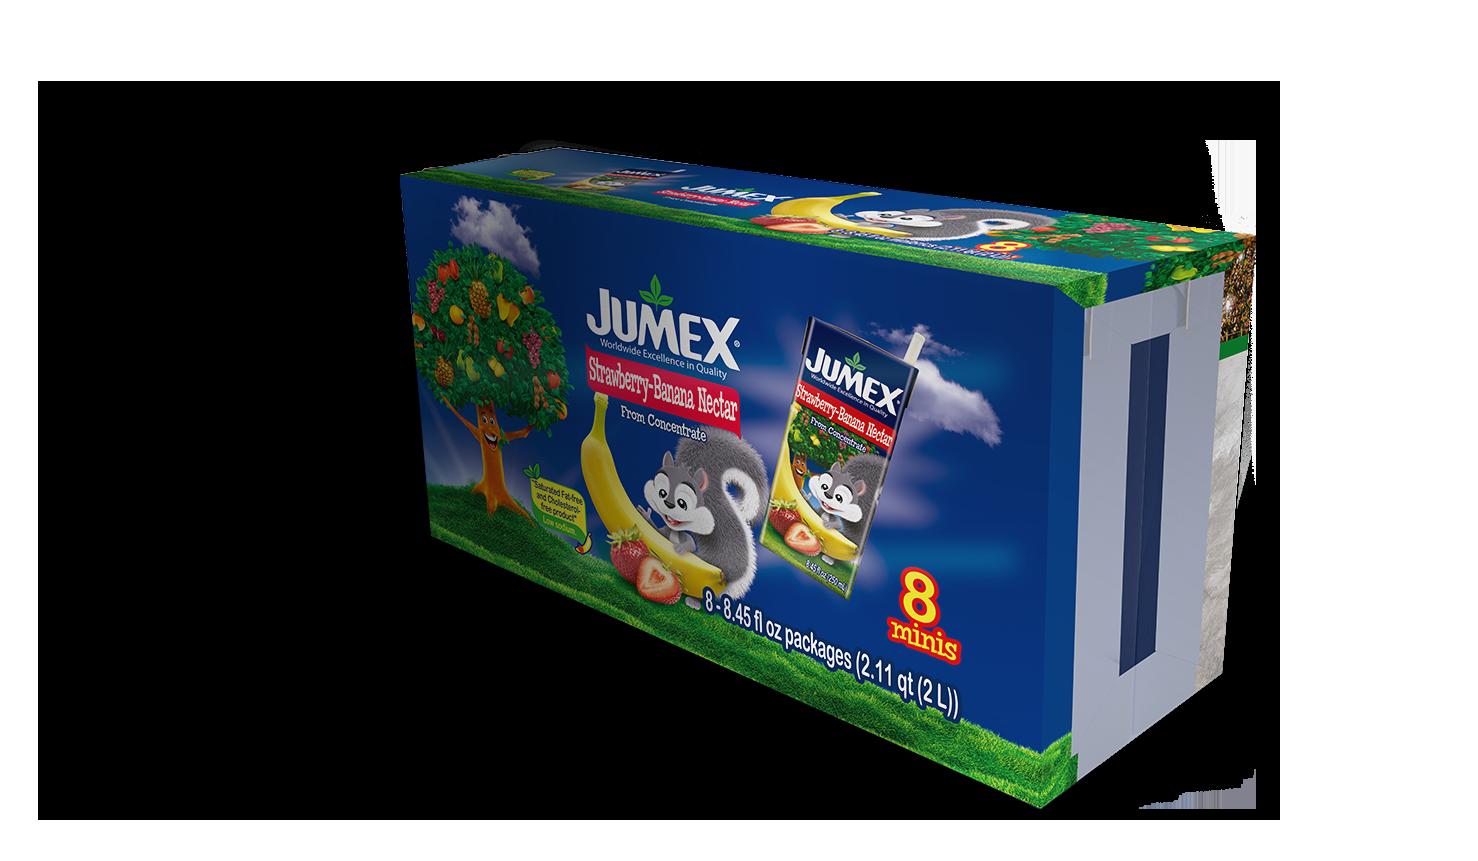 Jumex-LunchPack